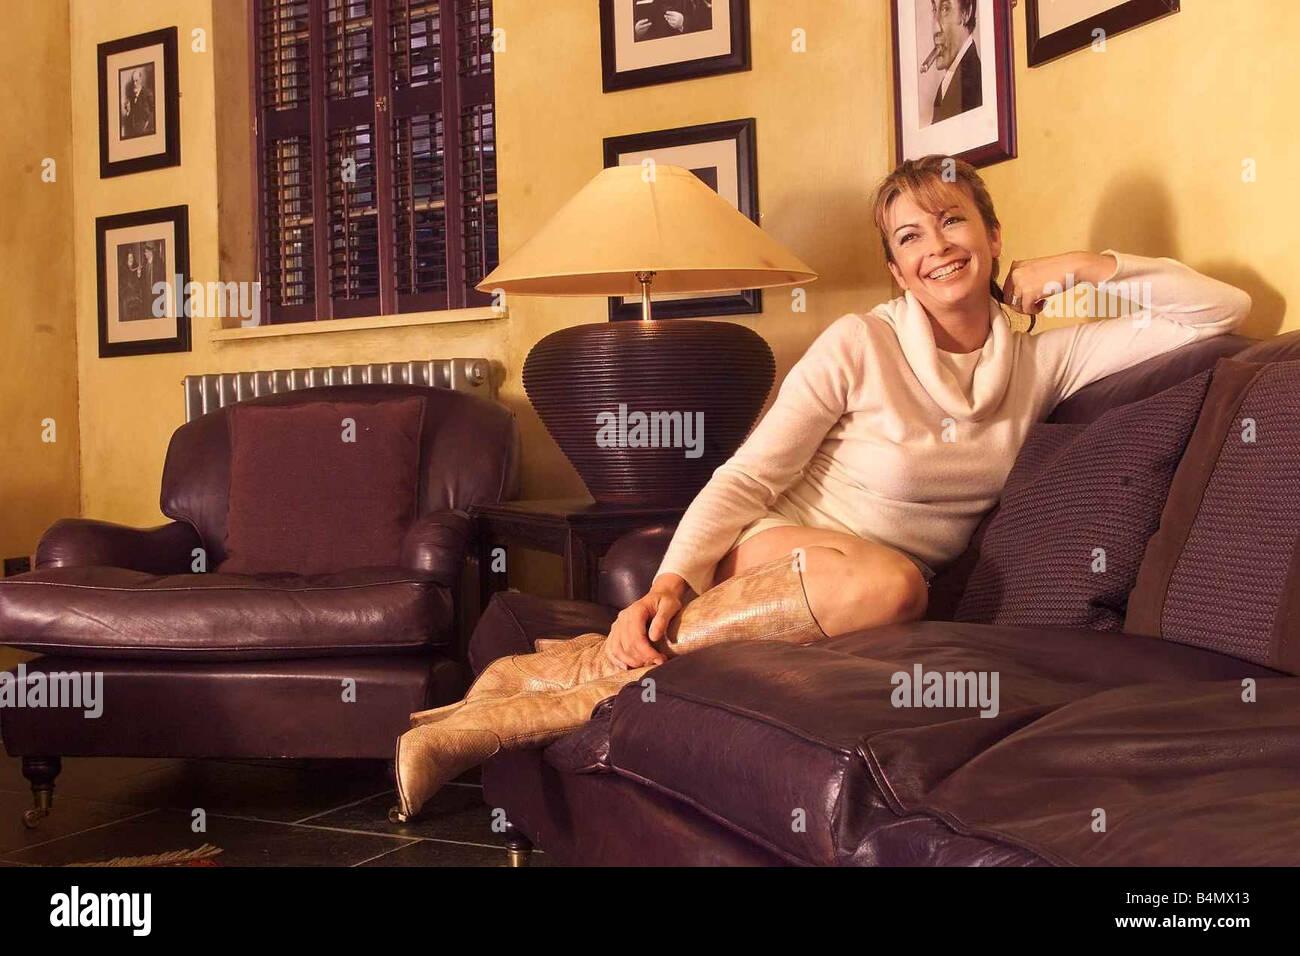 Suzy Perry TV Presenter January 2002 - Stock Image